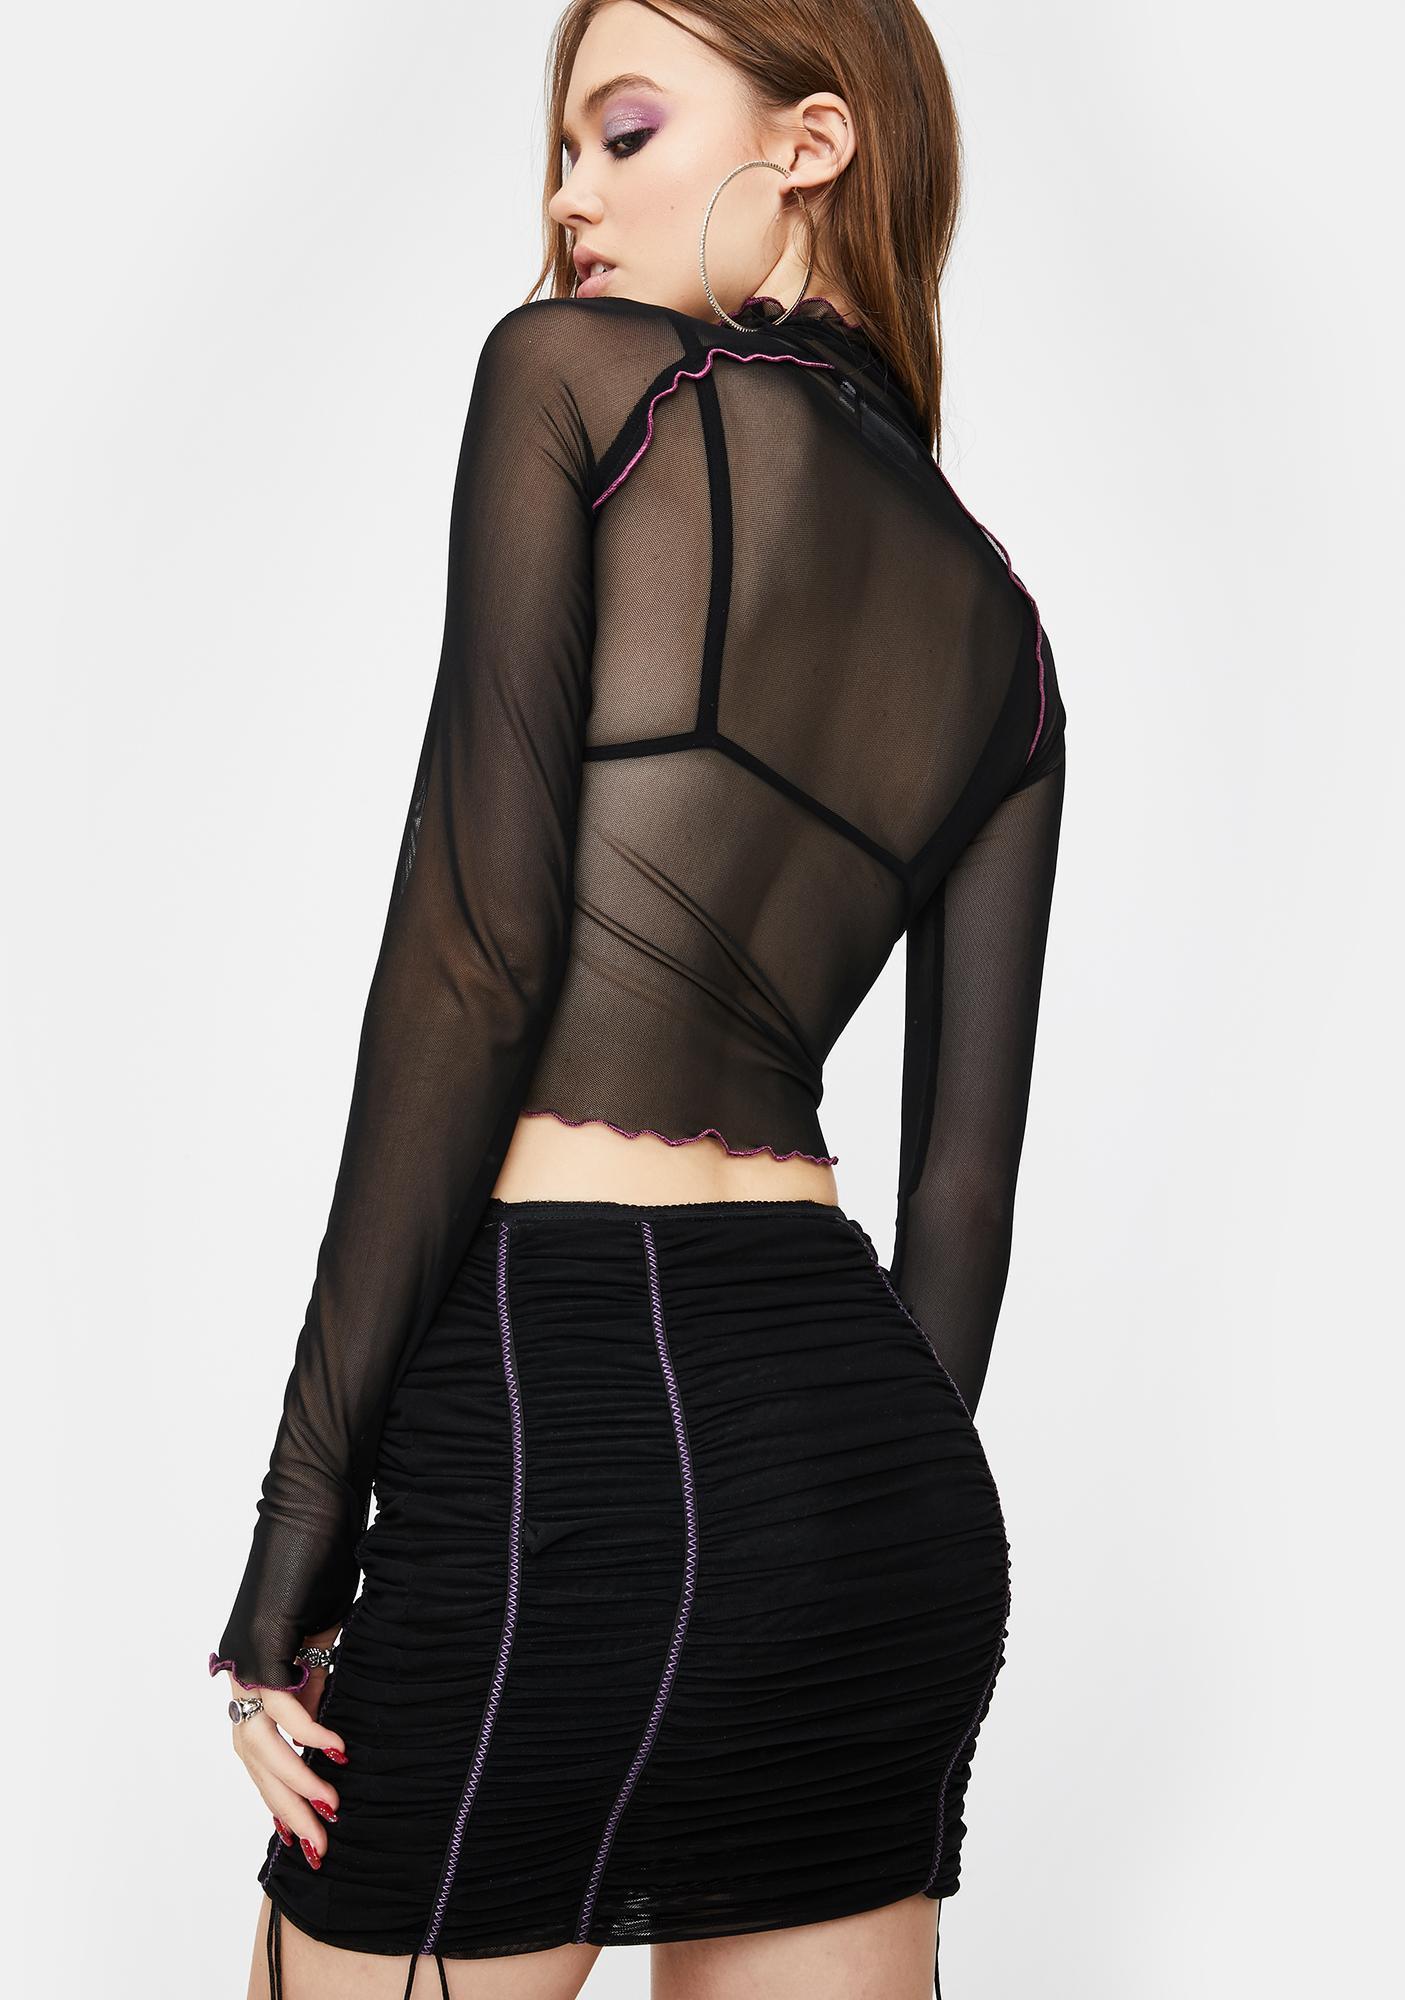 ZEMETA Black Mood Ruched Mini Skirt